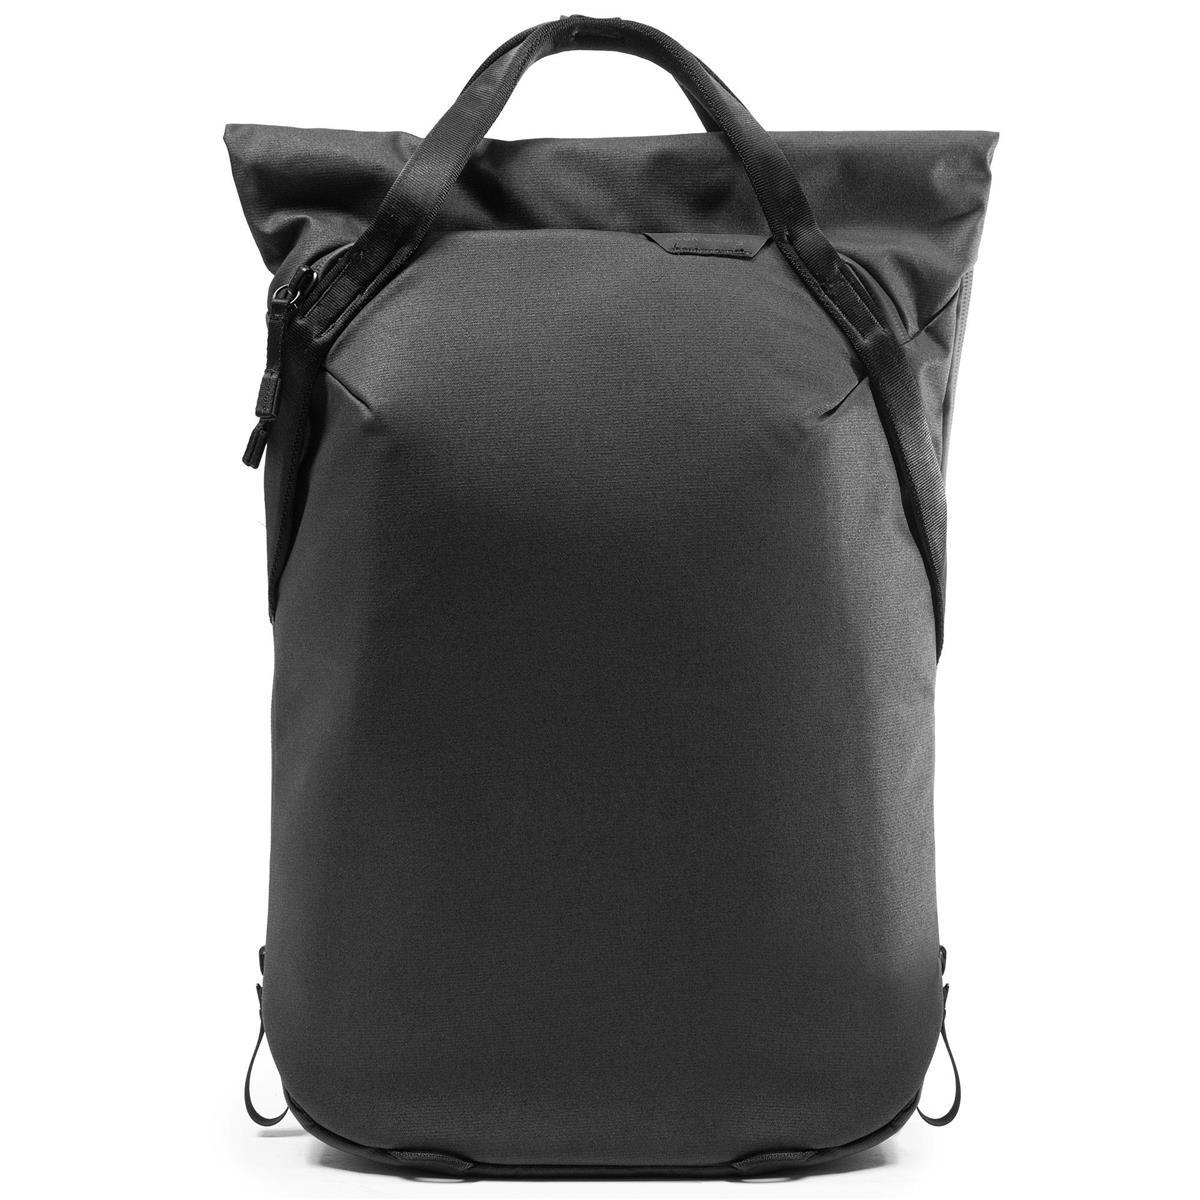 Peak Design Everyday Totepack (Black)